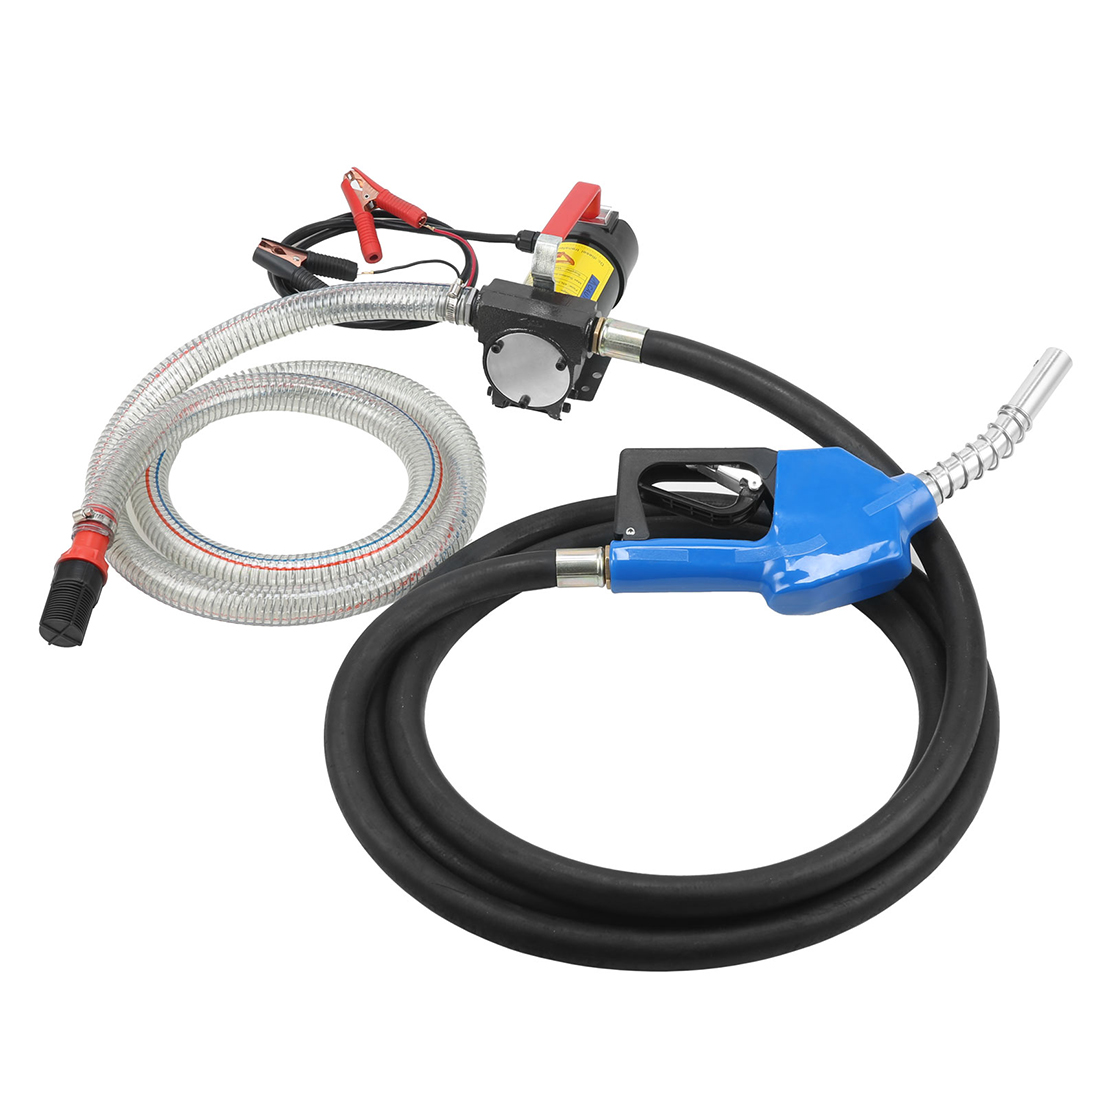 Portable 12V Diesel Fluid Extractor Electric Transfer Pump Car Fuel Auto Speed diy brand dollar price 12v oil for diesel fluid sump extractor transfer pump for electric motorbike car oil transfer pump